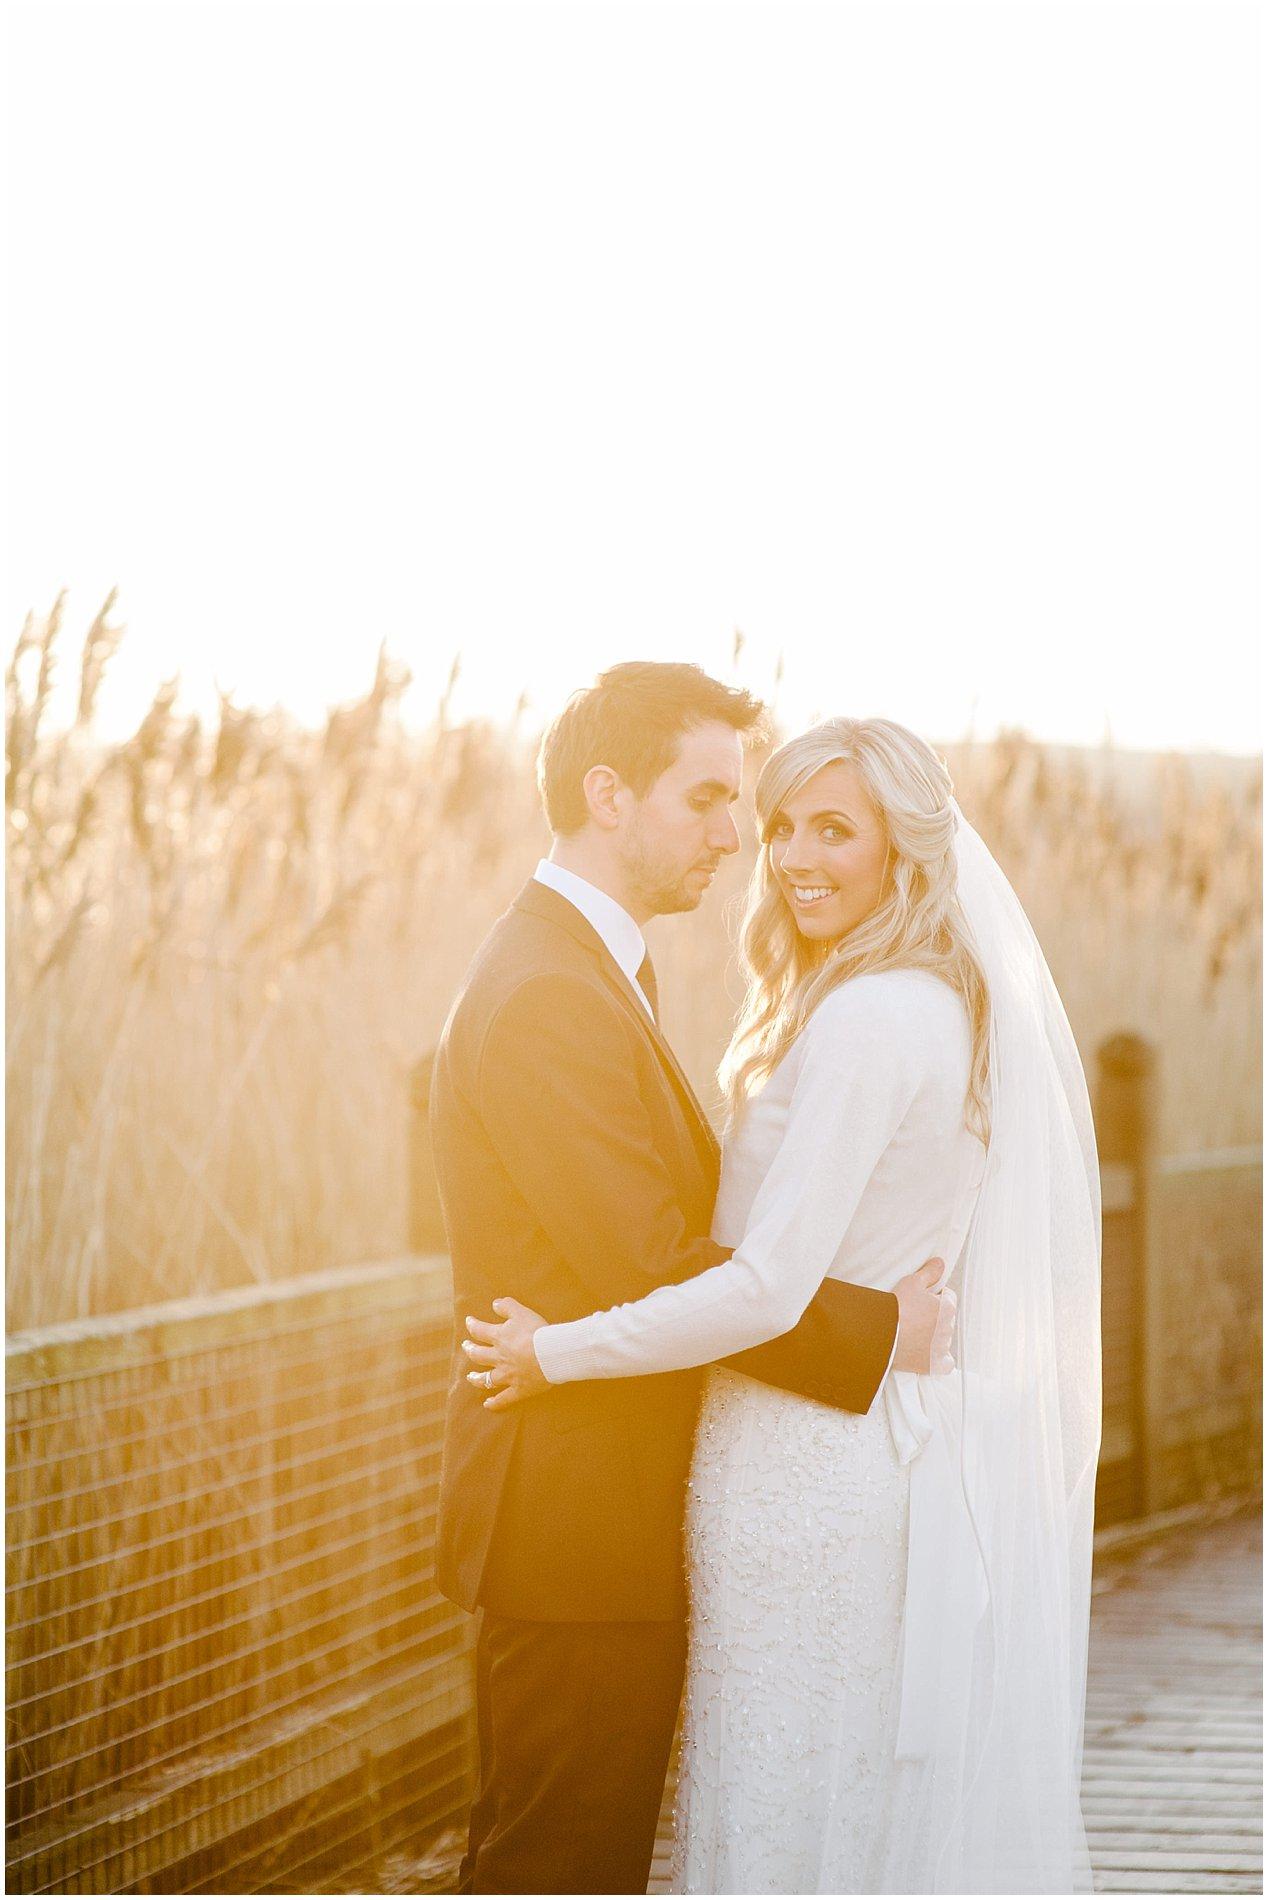 jill_Chris_Lough_Erne_Resort_Wedding_0134.jpg